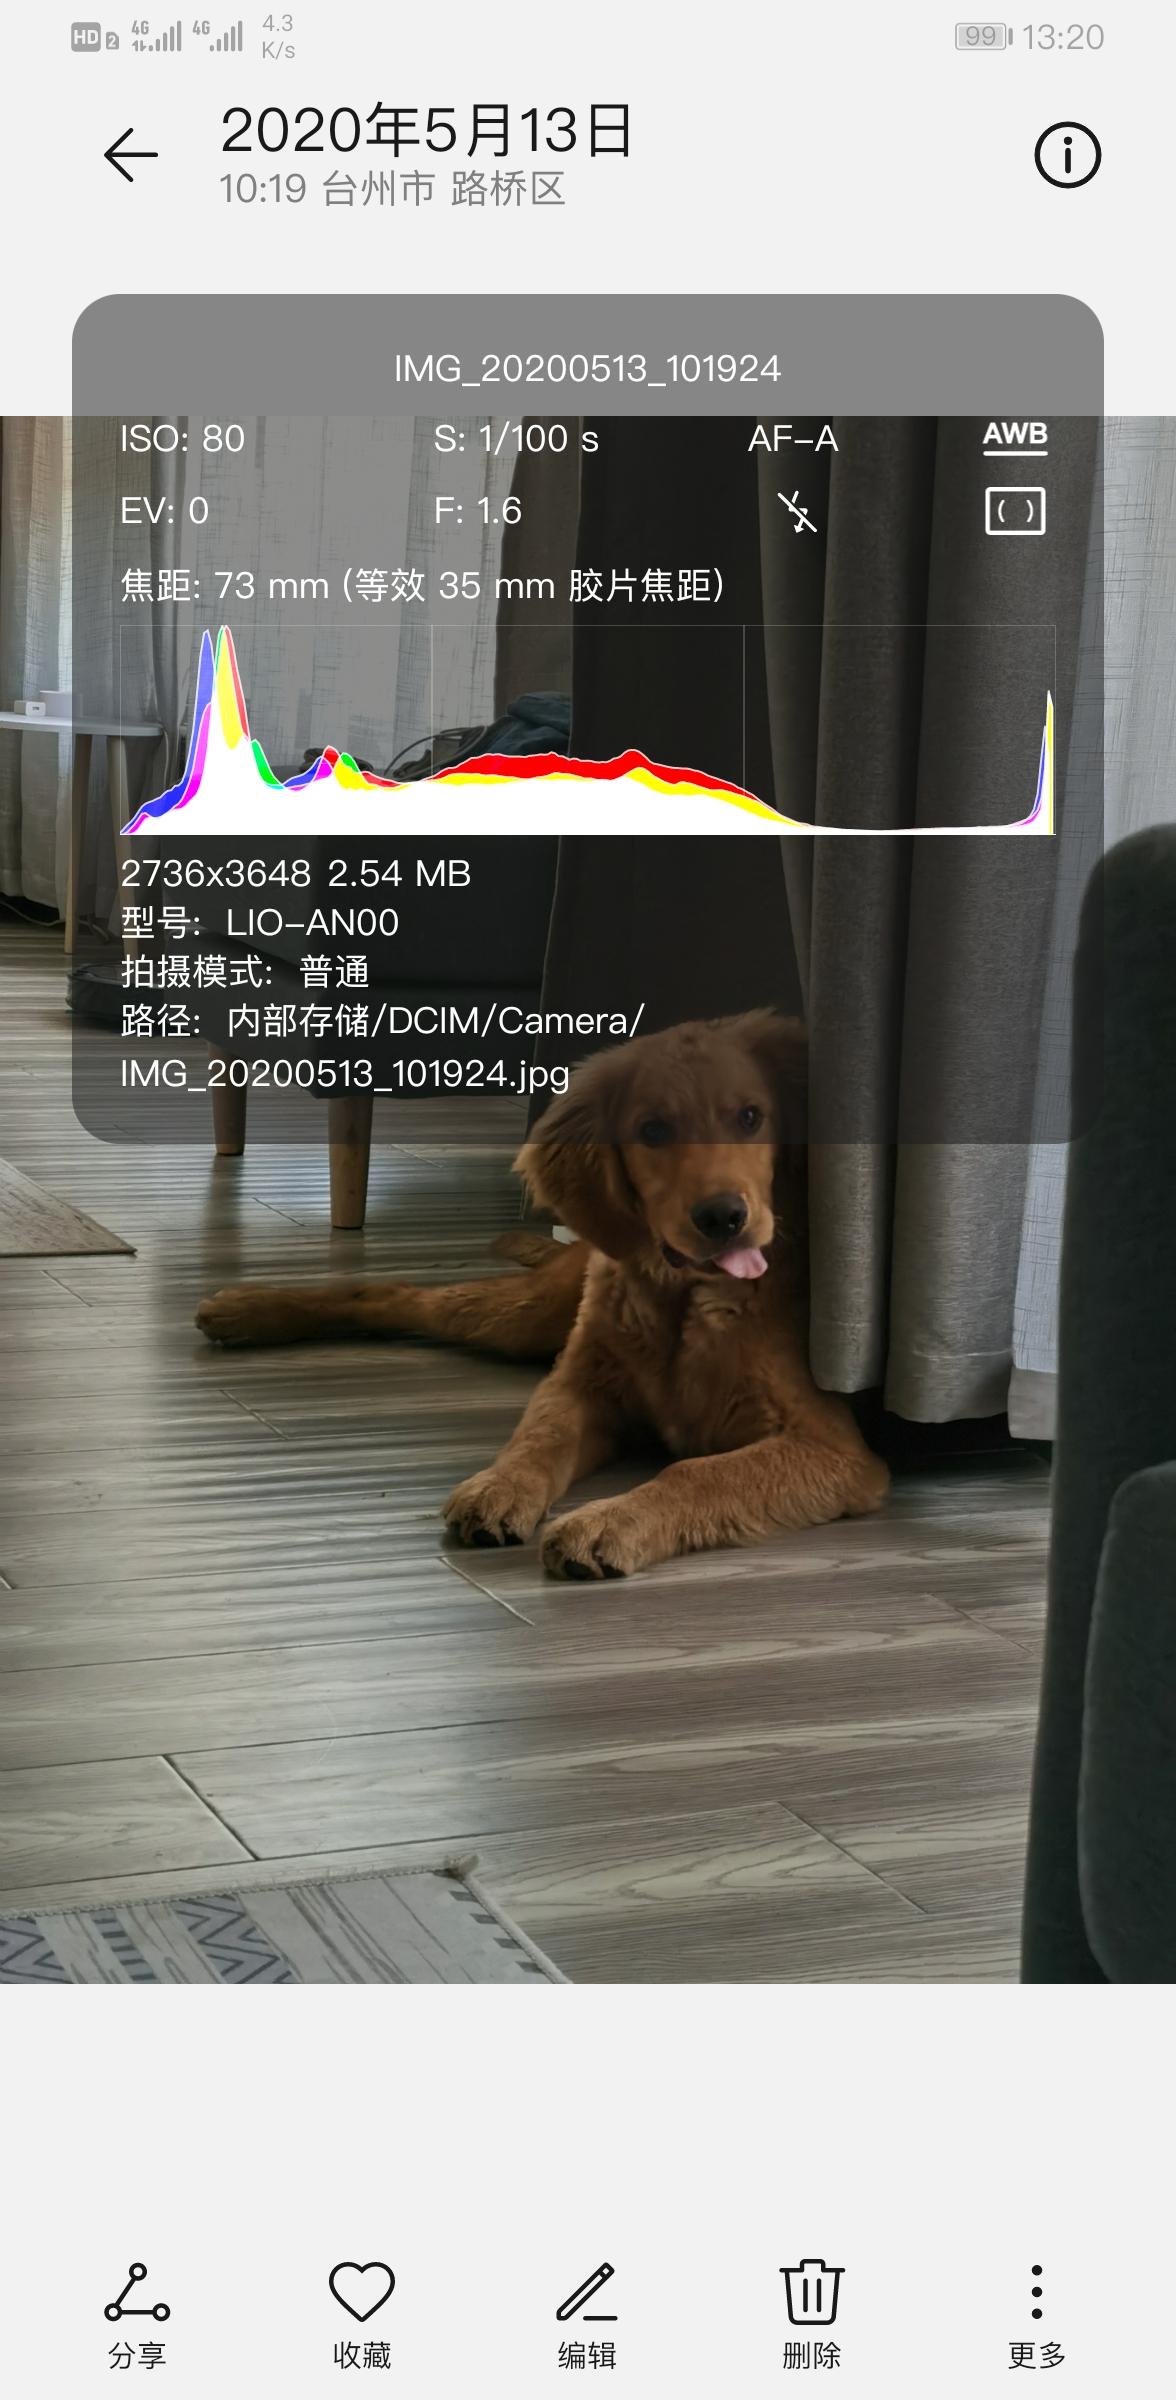 Screenshot_20200513_132035_com.android.gallery3d.jpg